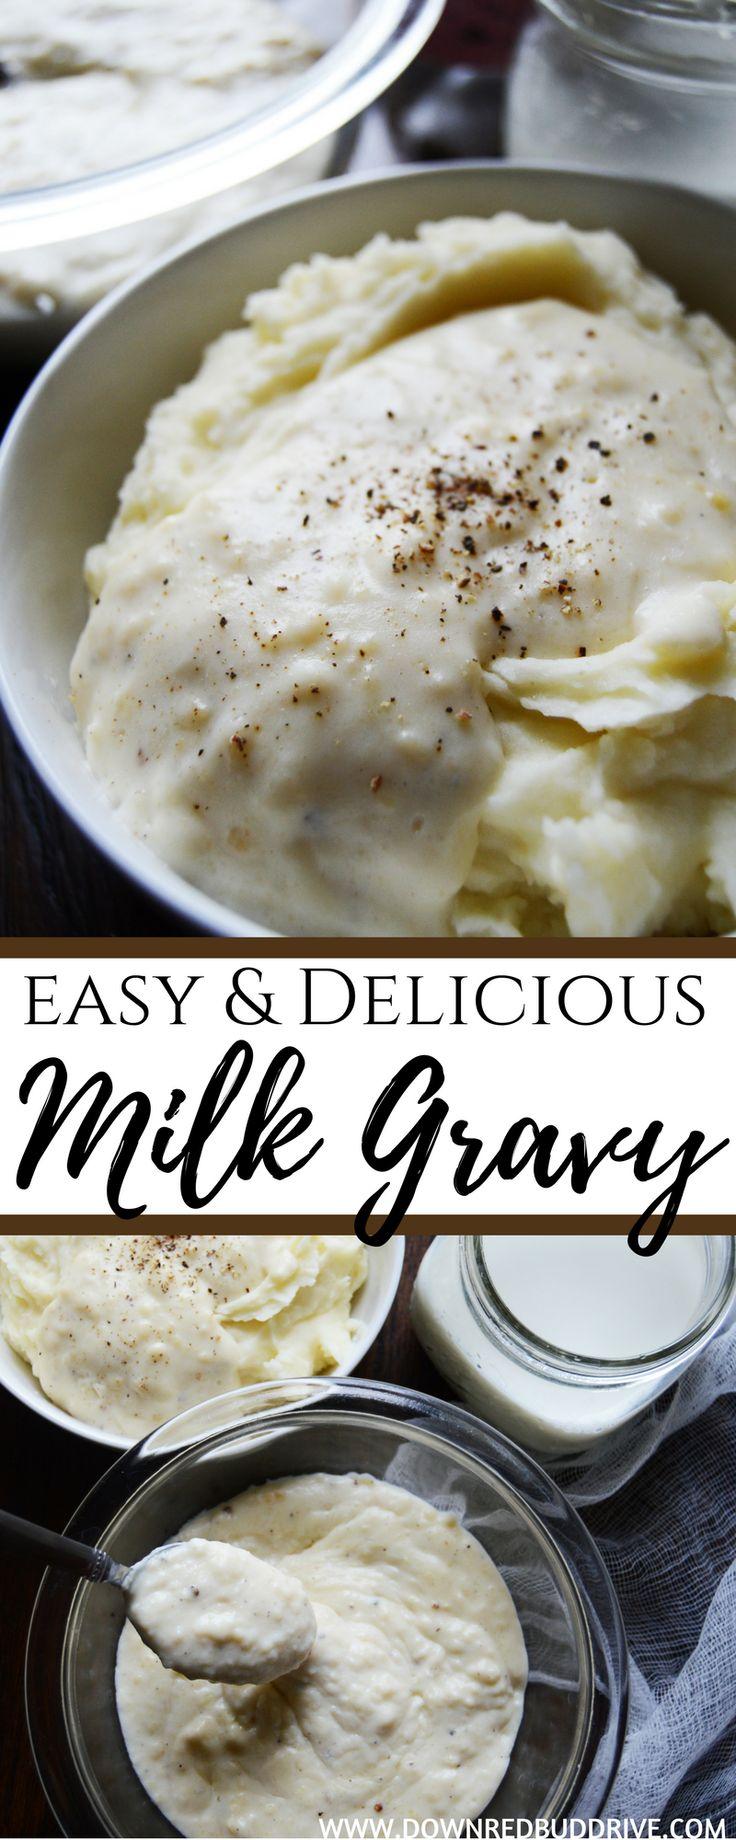 Milk Gravy | Milk Gravy Recipe | White Gravy Recipe | Easy Gravy Recipe | Breakfast Gravy | Sausage Gravy | Bacon Gravy Recipe | Sausage Biscuits and Gravy Recipe |